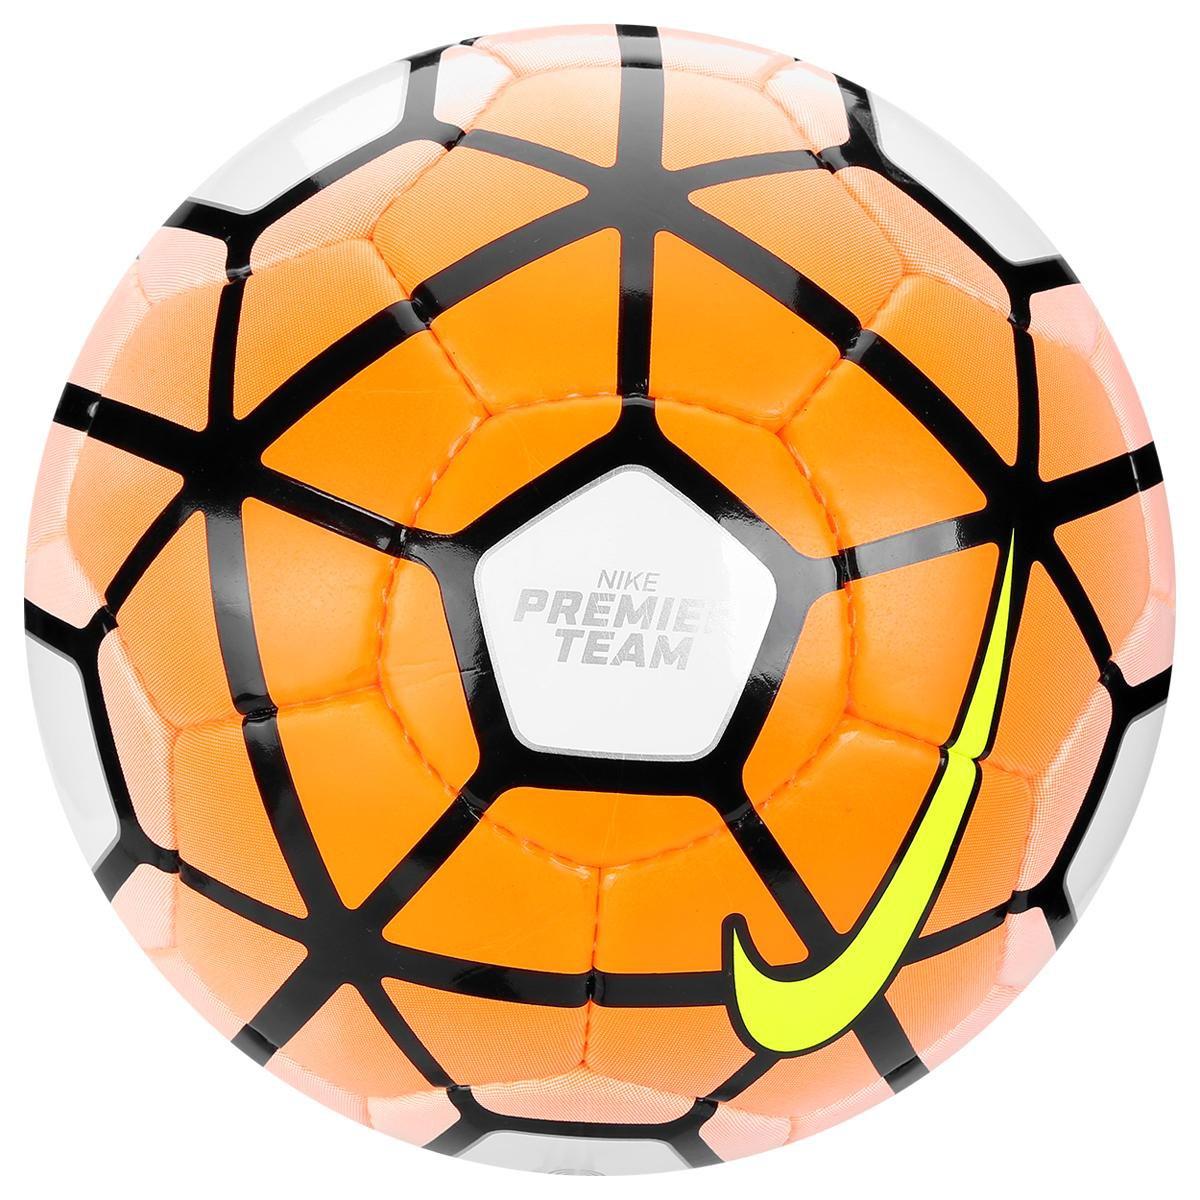 5770ae692c Bola Futebol Nike Premier Team Fifa Campo - Compre Agora